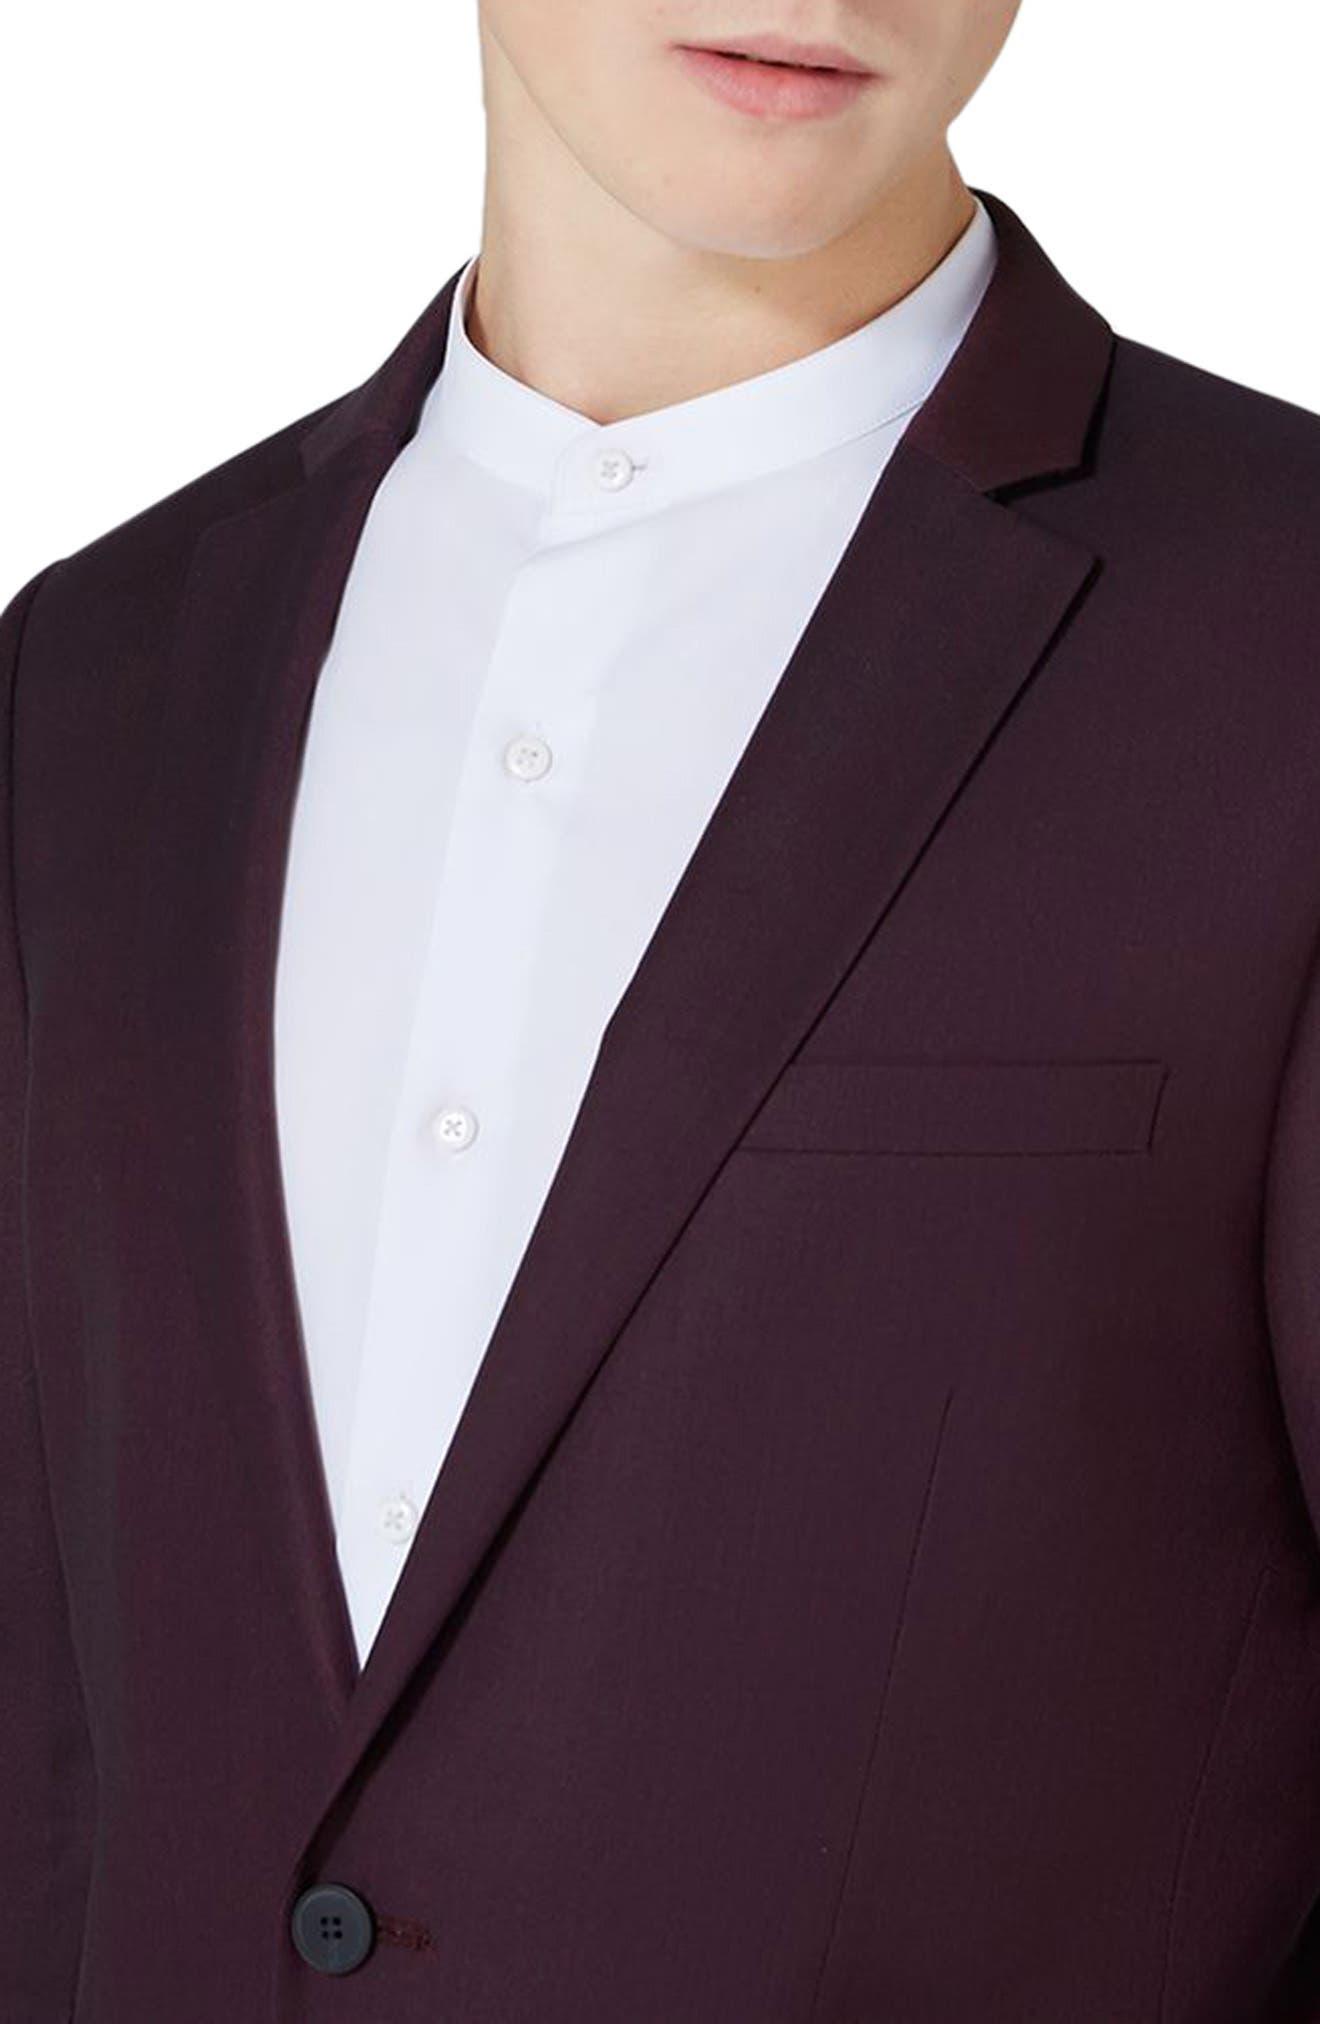 Skinny Fit Plum One-Button Suit Jacket,                             Main thumbnail 1, color,                             500